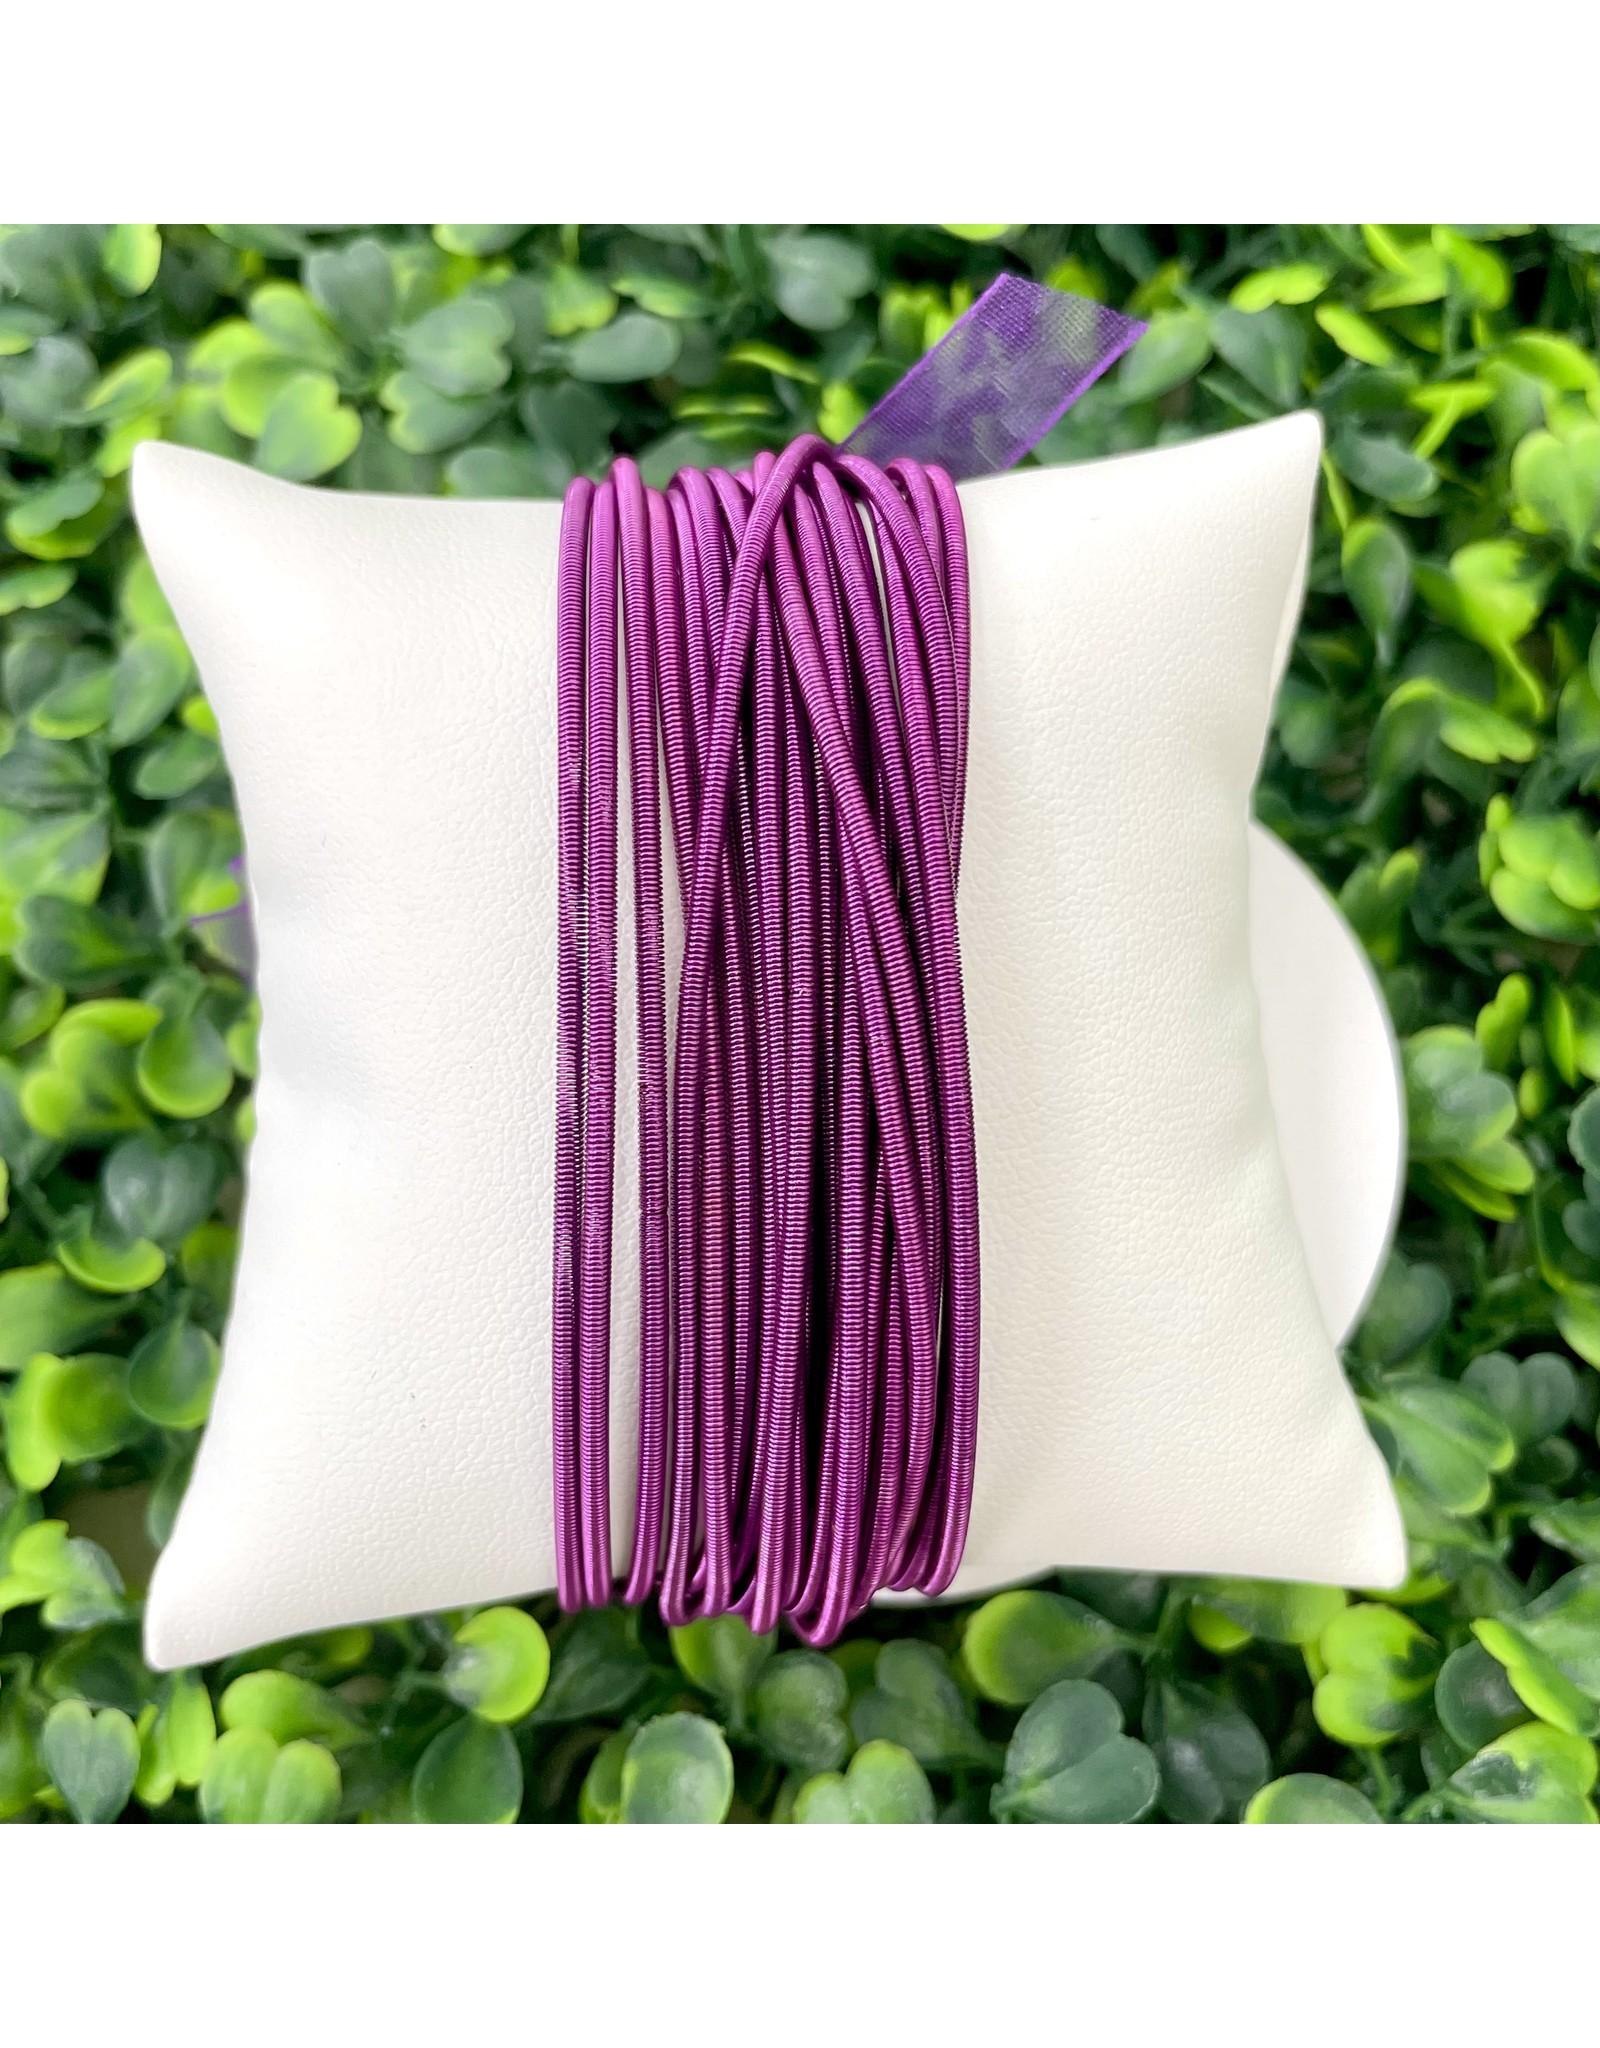 Purple Guitar String Bracelets - Set of 10